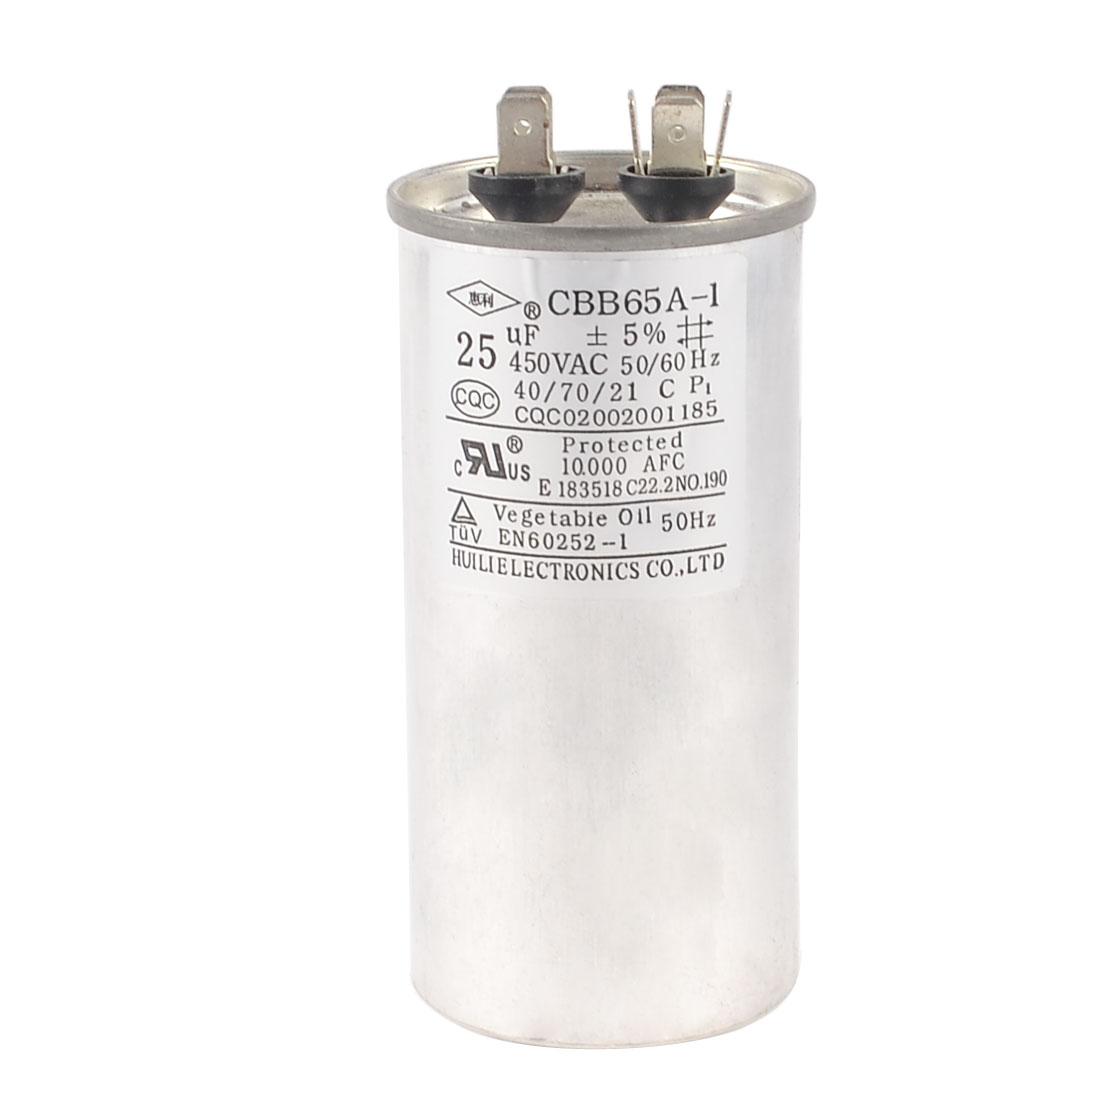 Washing Machine Lug Terminal Motor Run Capacitor 450VAC 25uF CBB65A-1